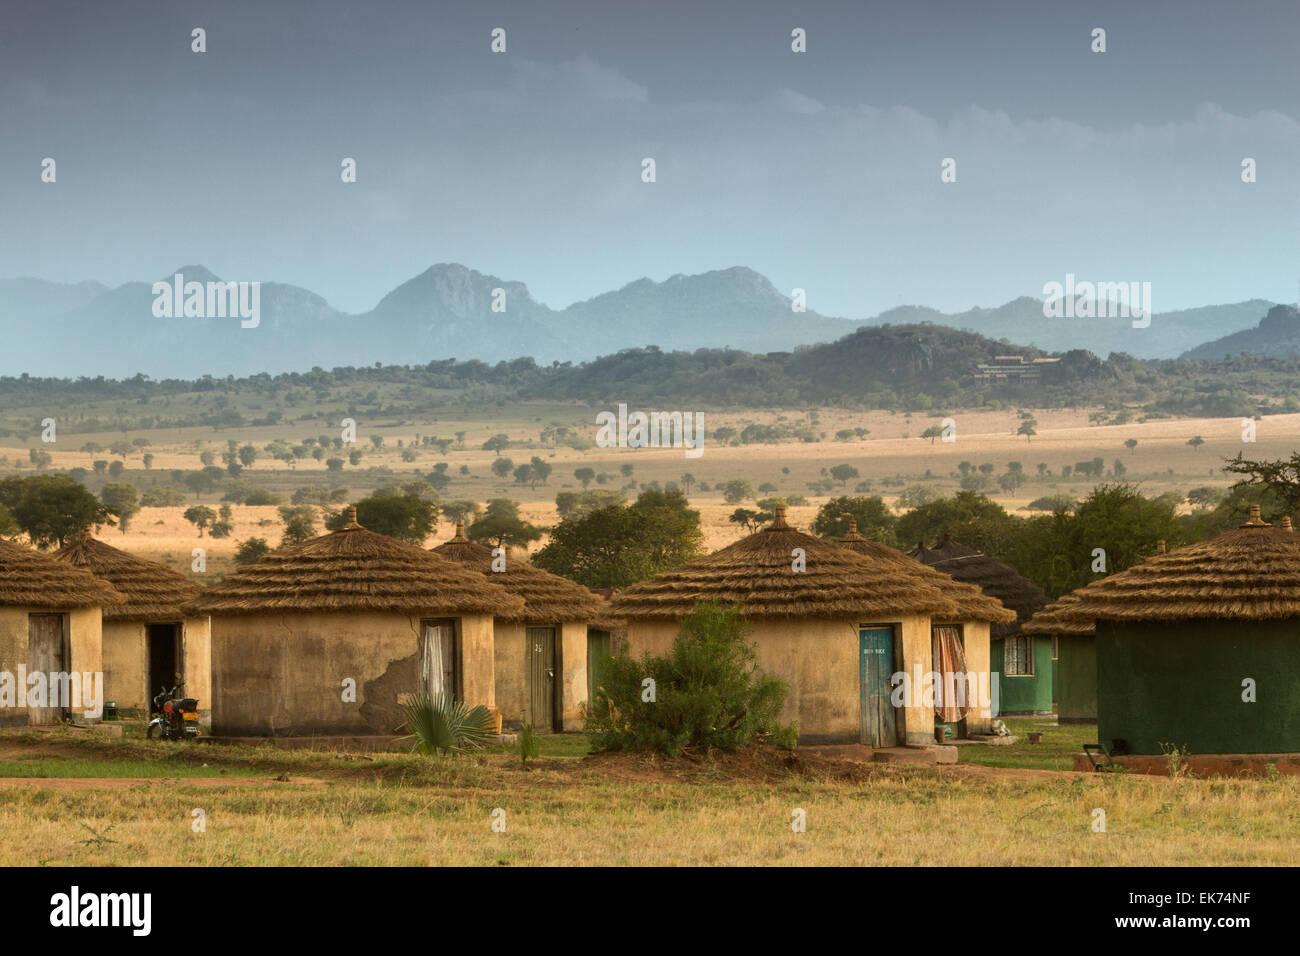 Apoka bandas (lodge) at Kidepo Valley National Park in Northern Uganda, East Africa Stock Photo